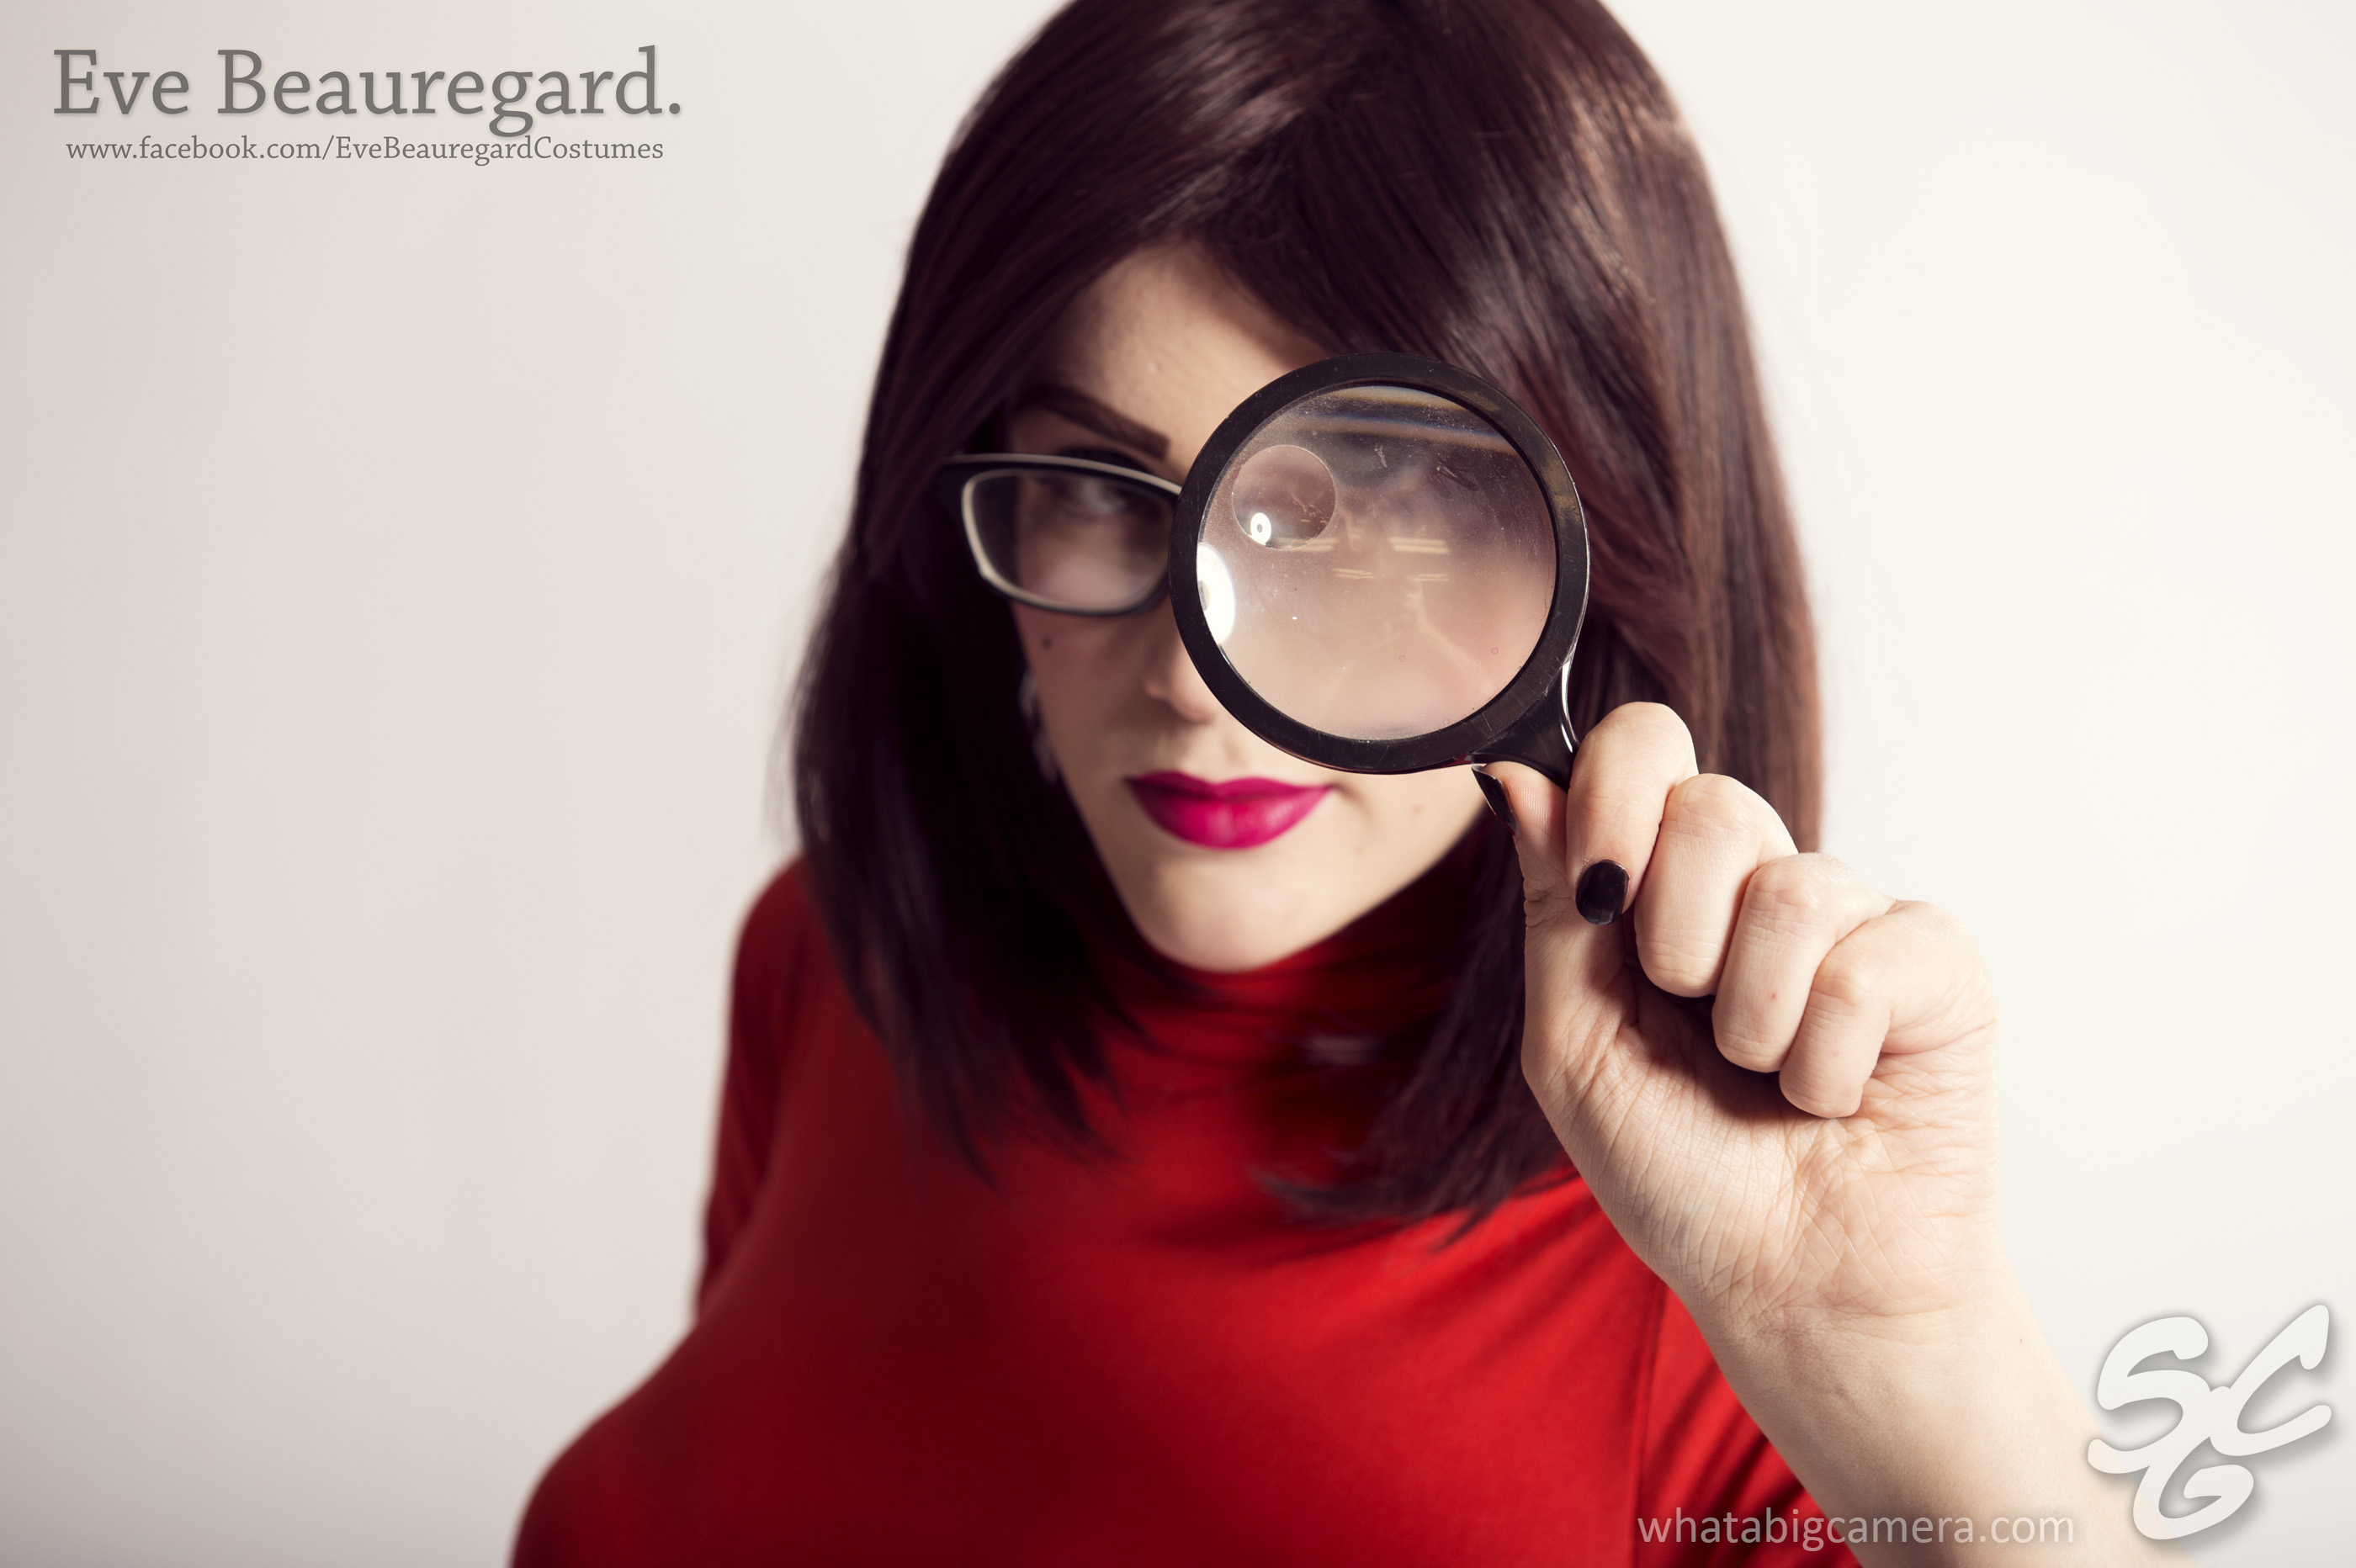 Eve Beauregard as Velma